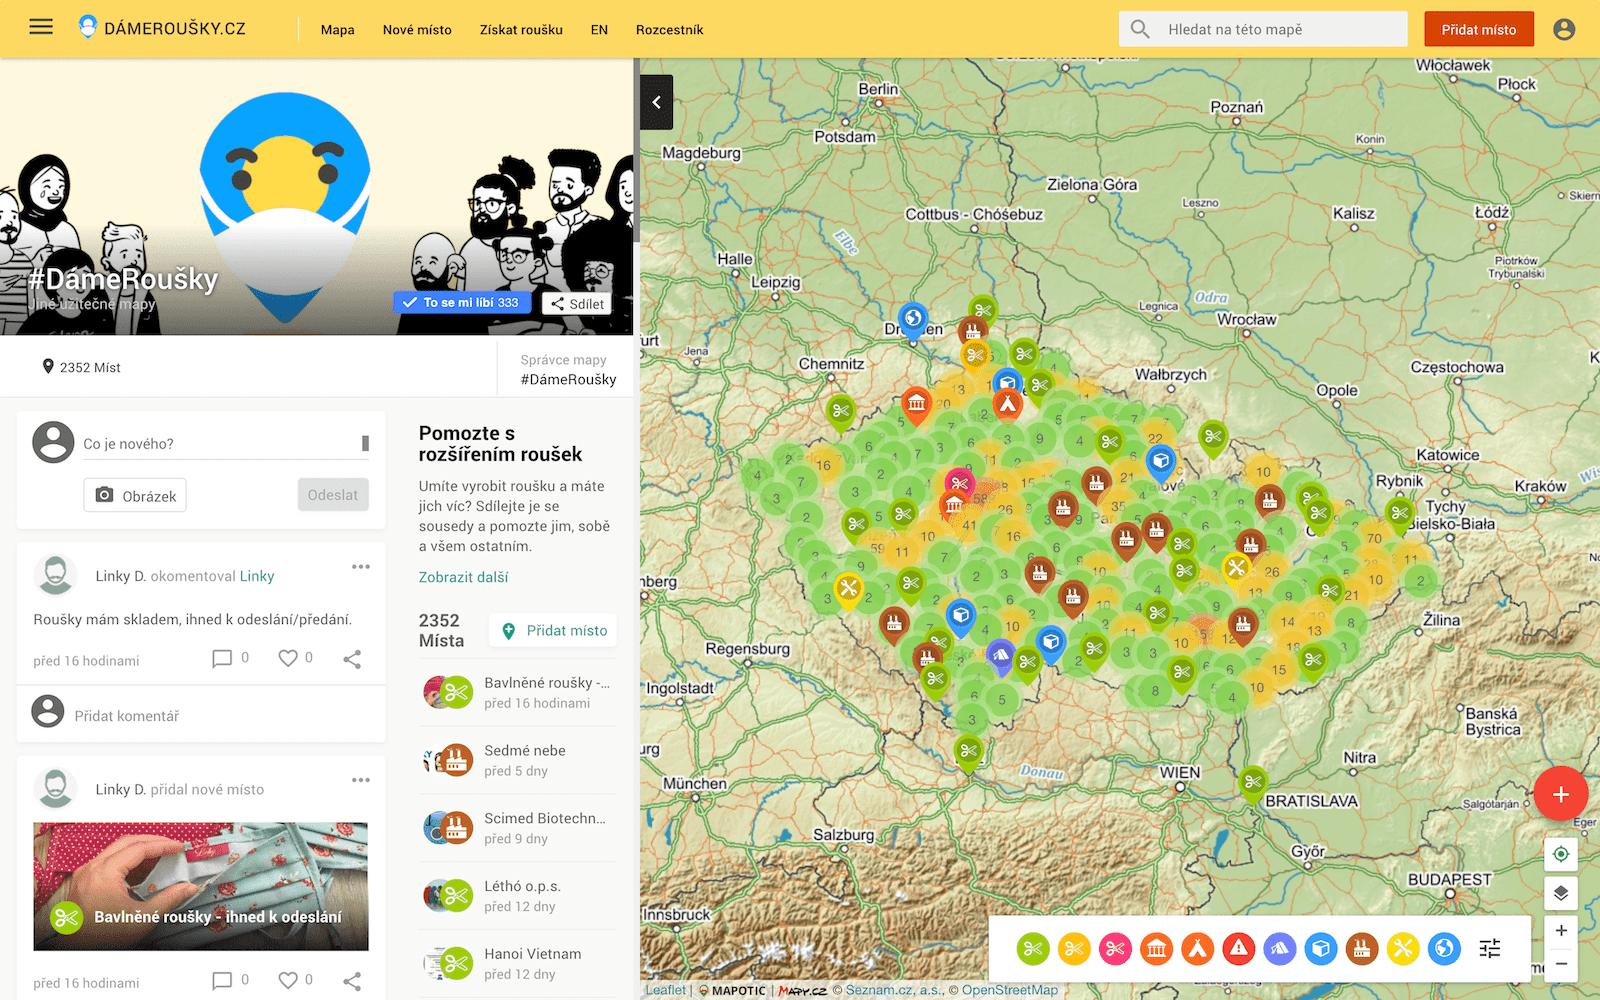 Damerousky mapa rousek